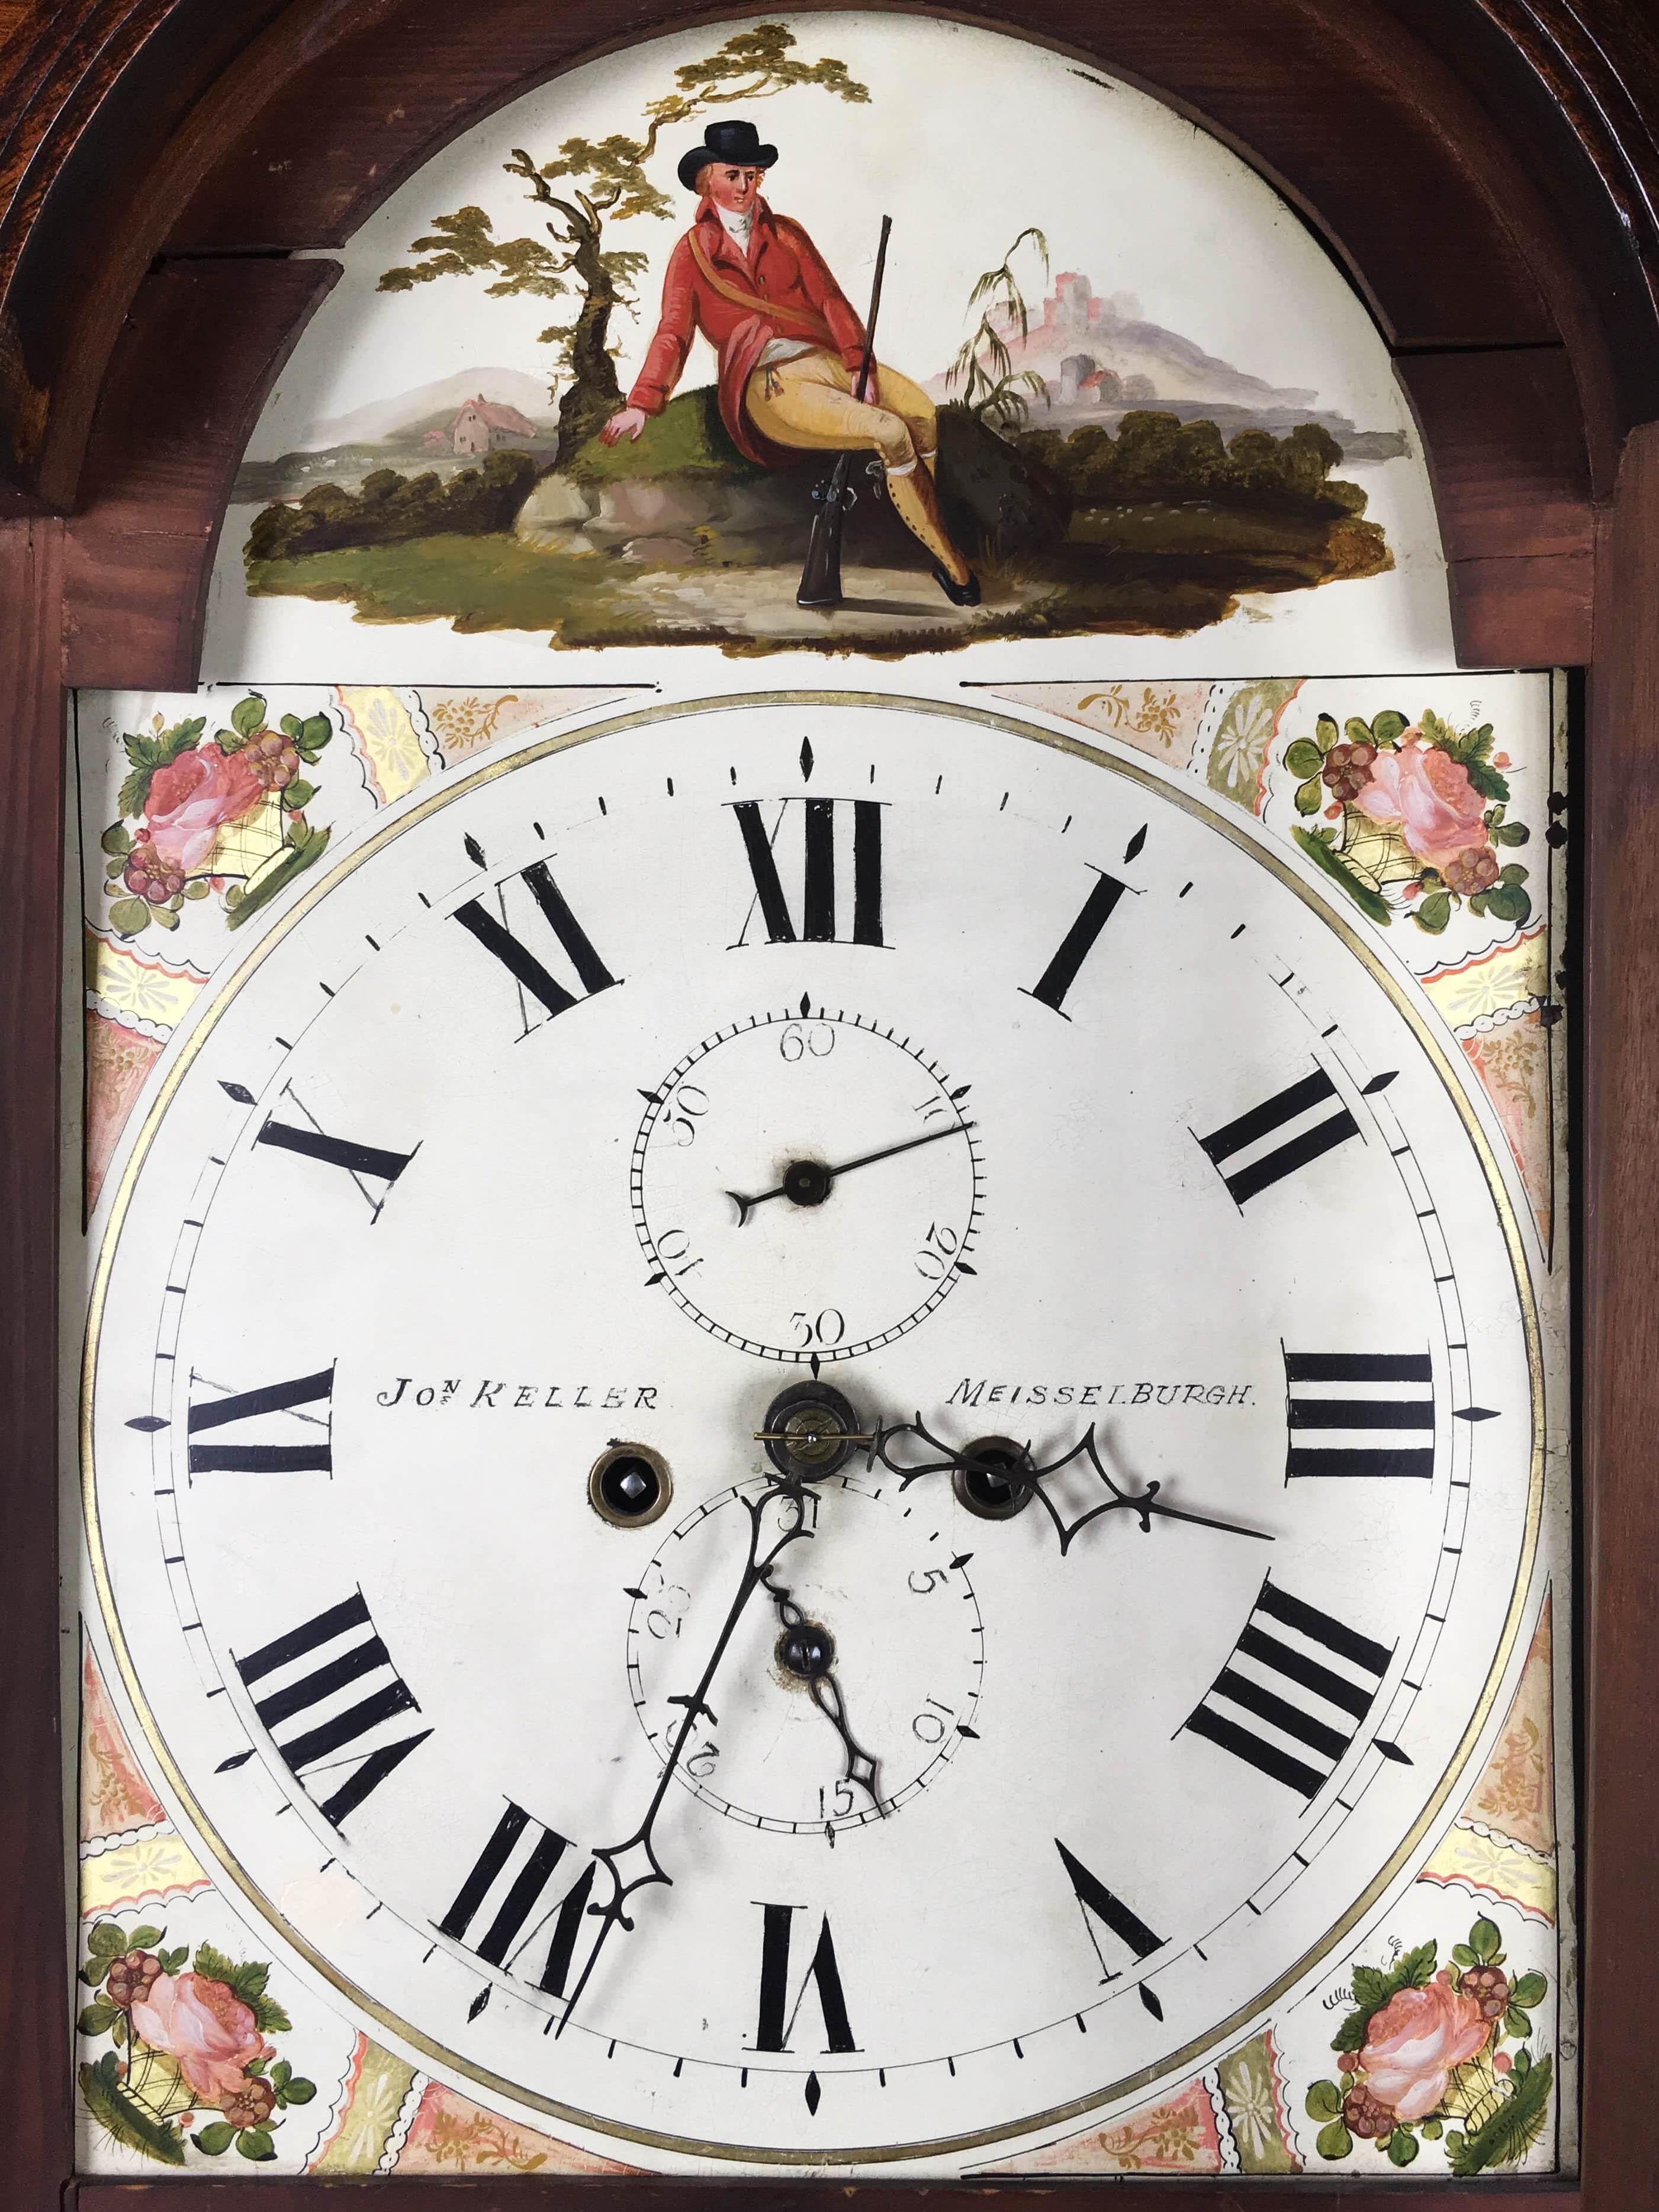 Jon Keller Tall Case Clock, Scotland